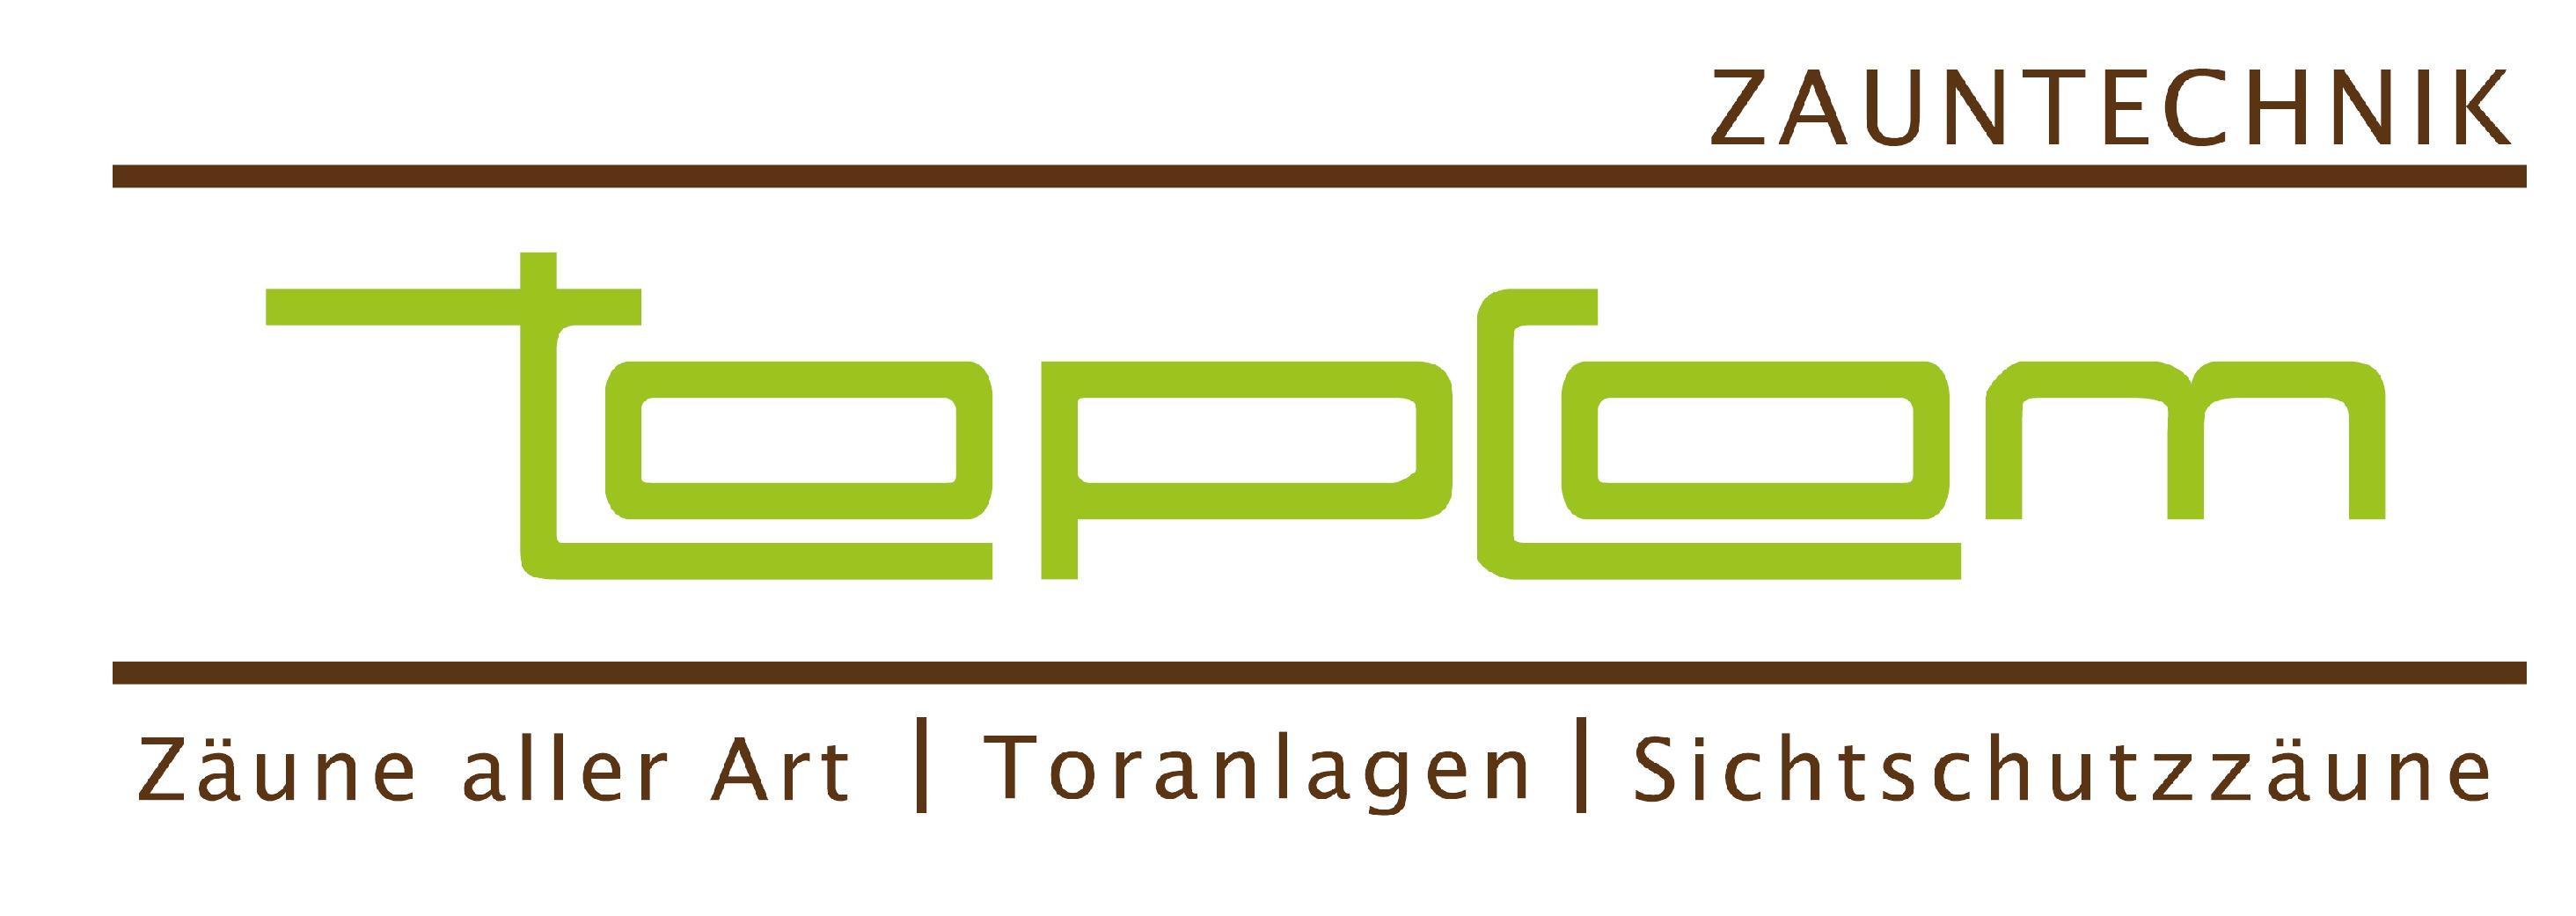 Topcom - Zauntechnik